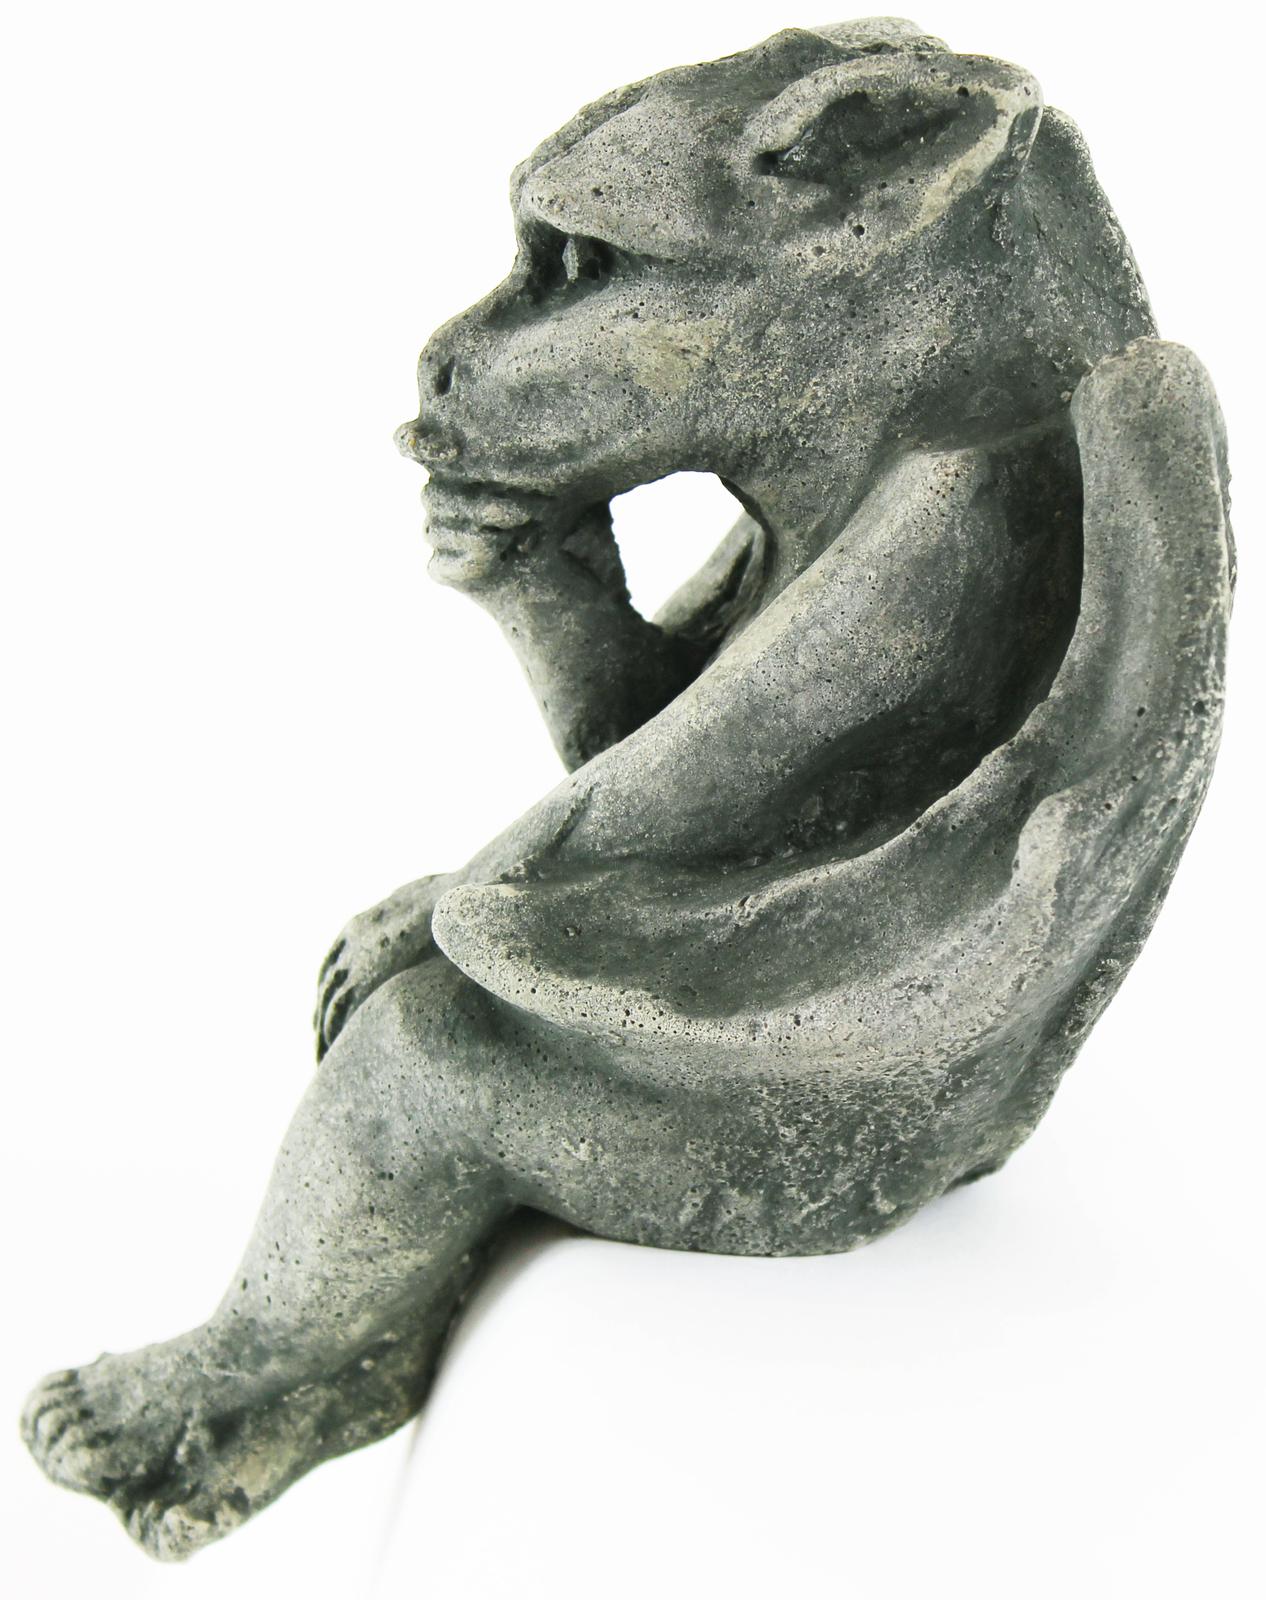 Sitting Gargoyle Concrete Ornament Statue